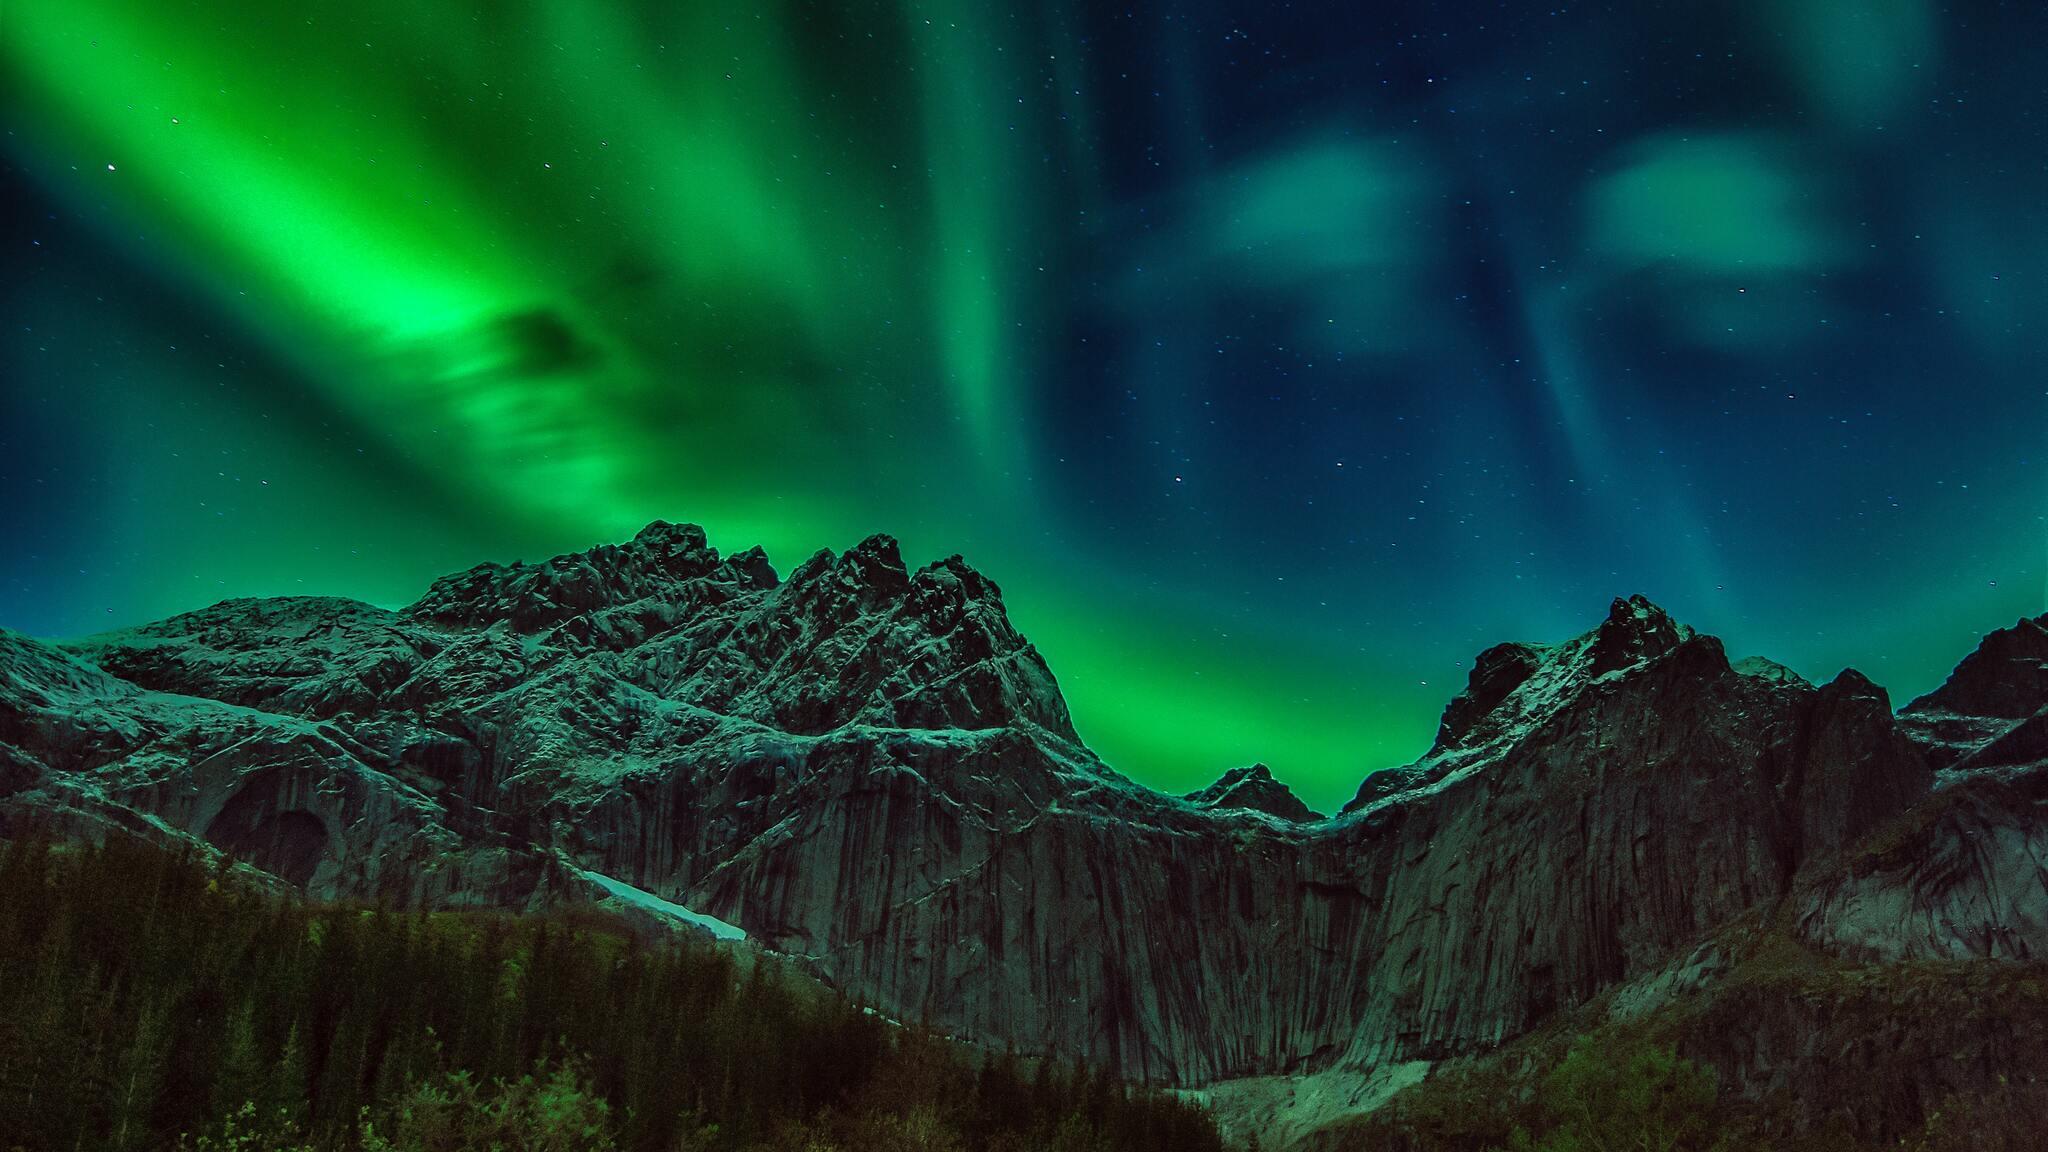 green-and-brown-mountain-under-green-sky-5k-sr.jpg